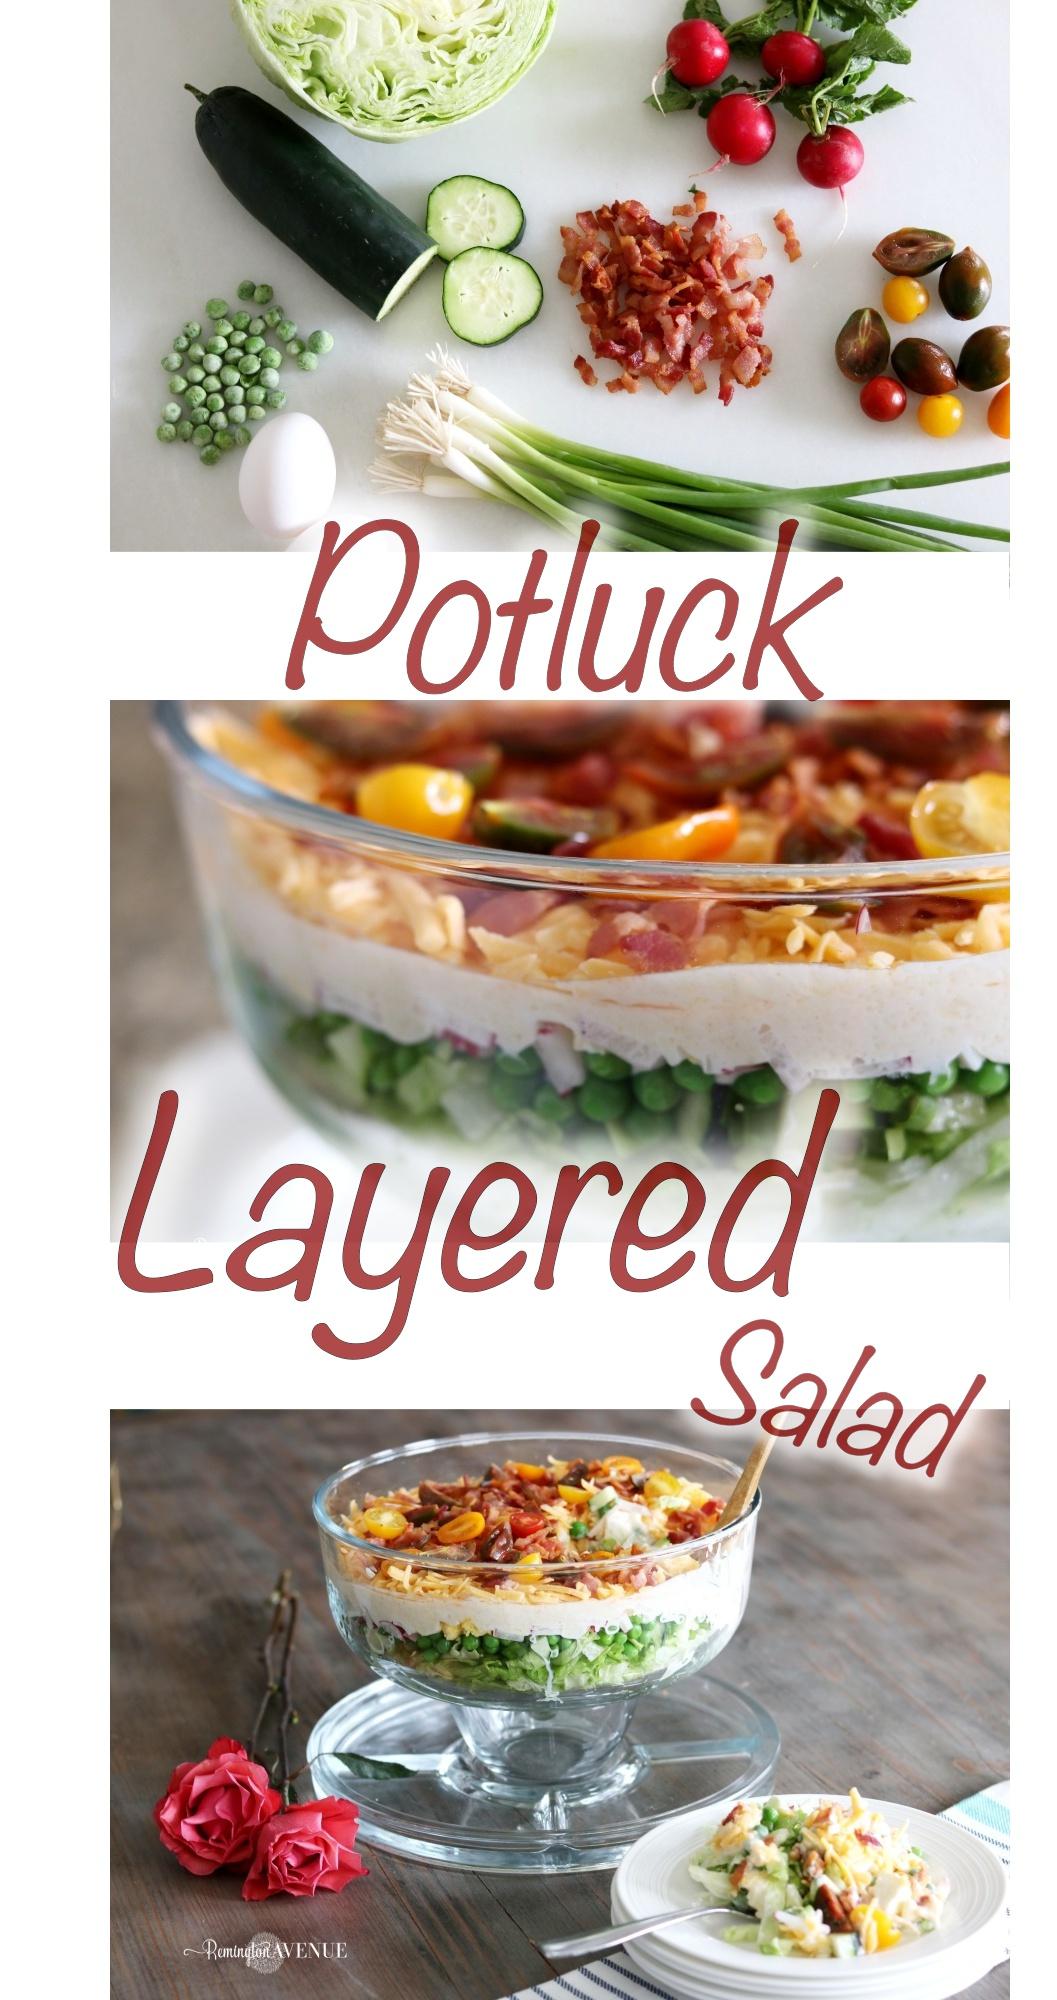 potluck recipe, potluck dish, salad, layered salad, 7 layered salad, mothers day recipe